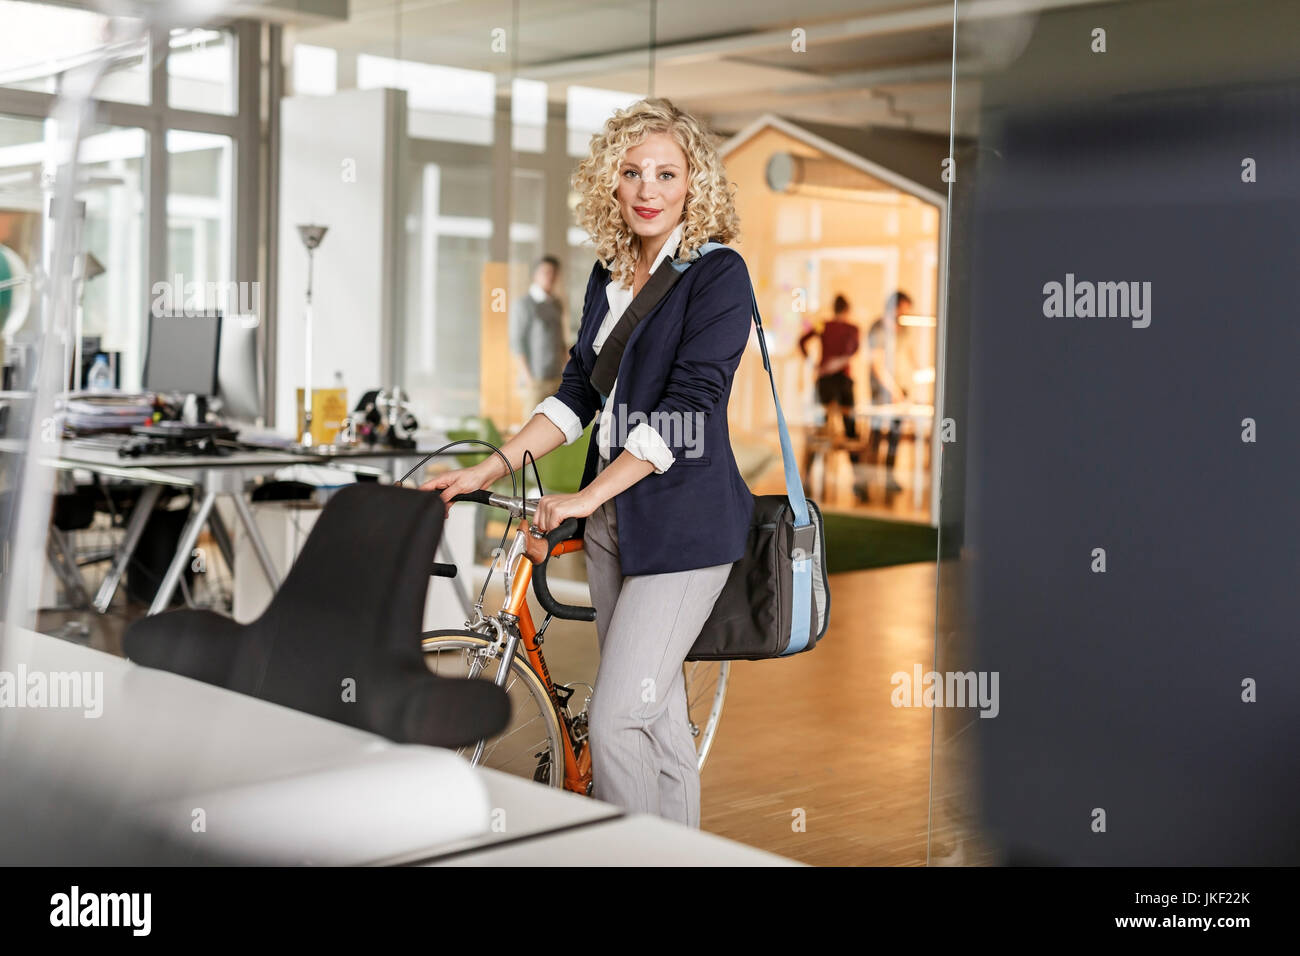 Portrait der Frau mit dem Fahrrad im Büro Stockbild